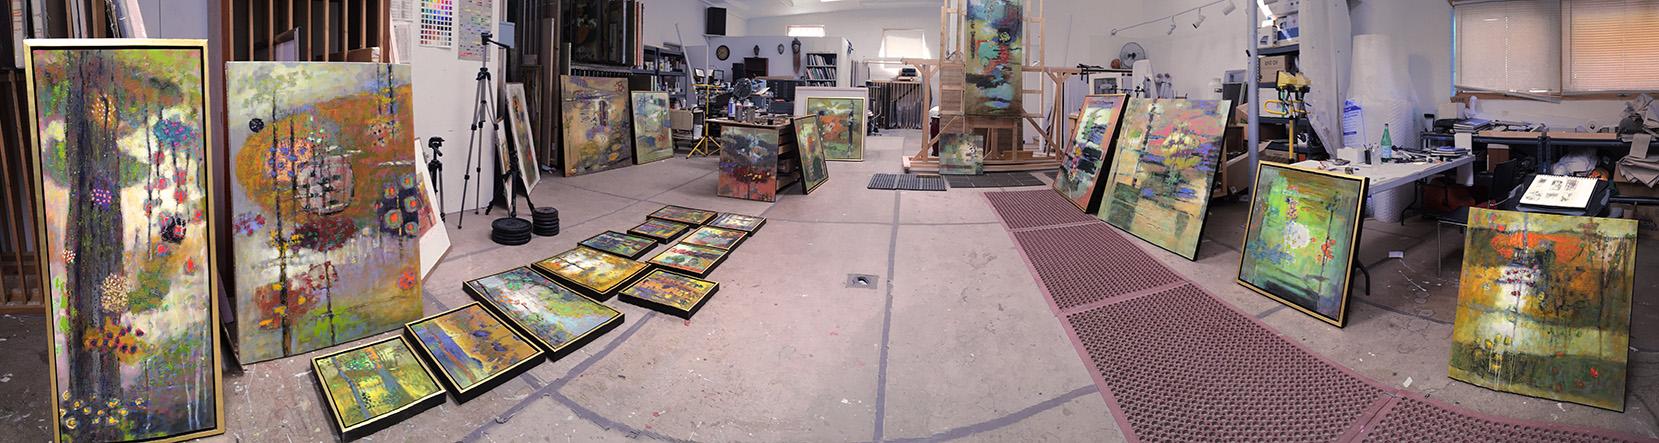 Preparing for Rick's upcoming show at Hunter Kirkland Contemporary